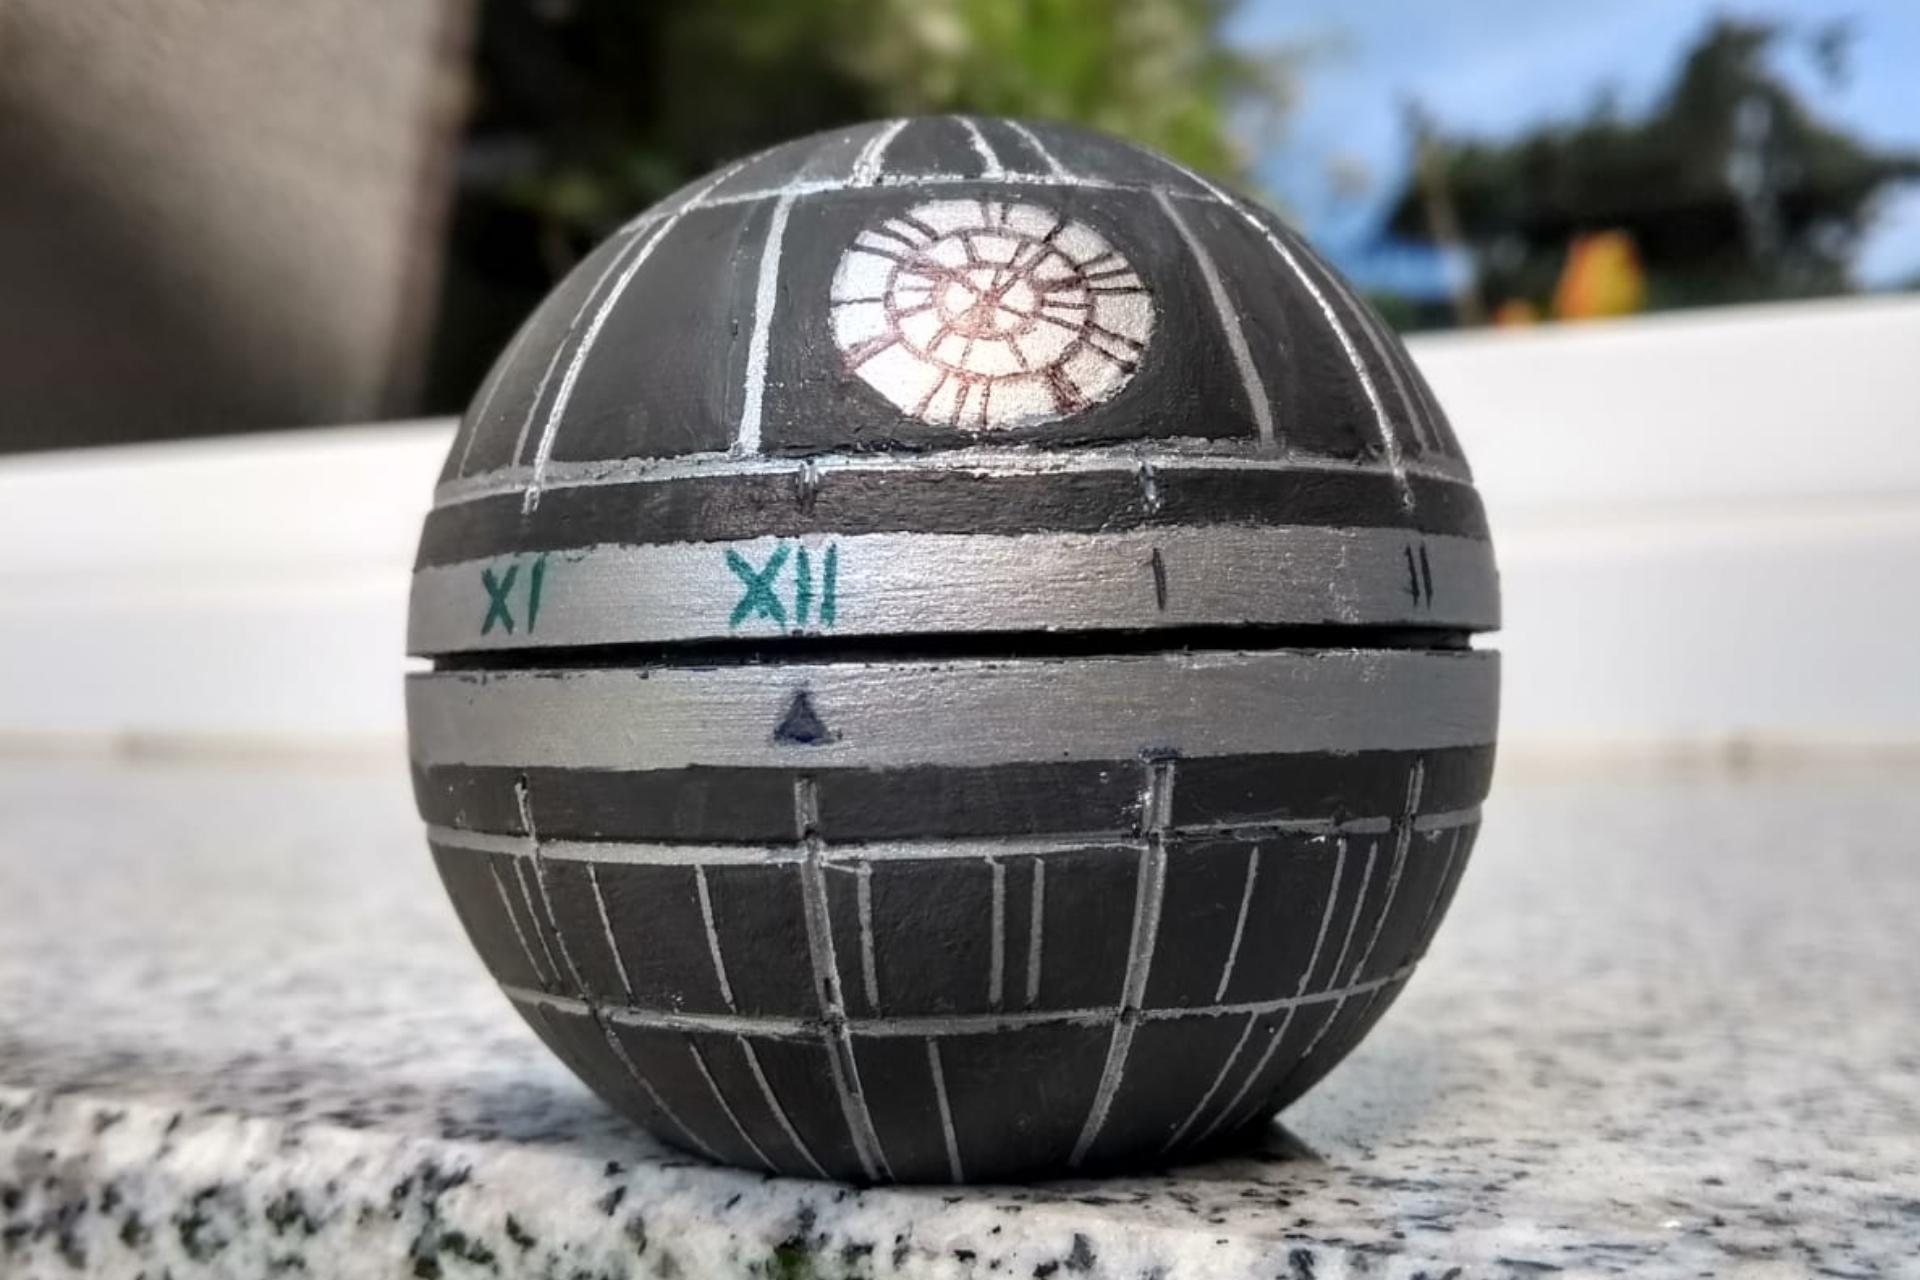 Eier-Uhr im Sci-Fi Look